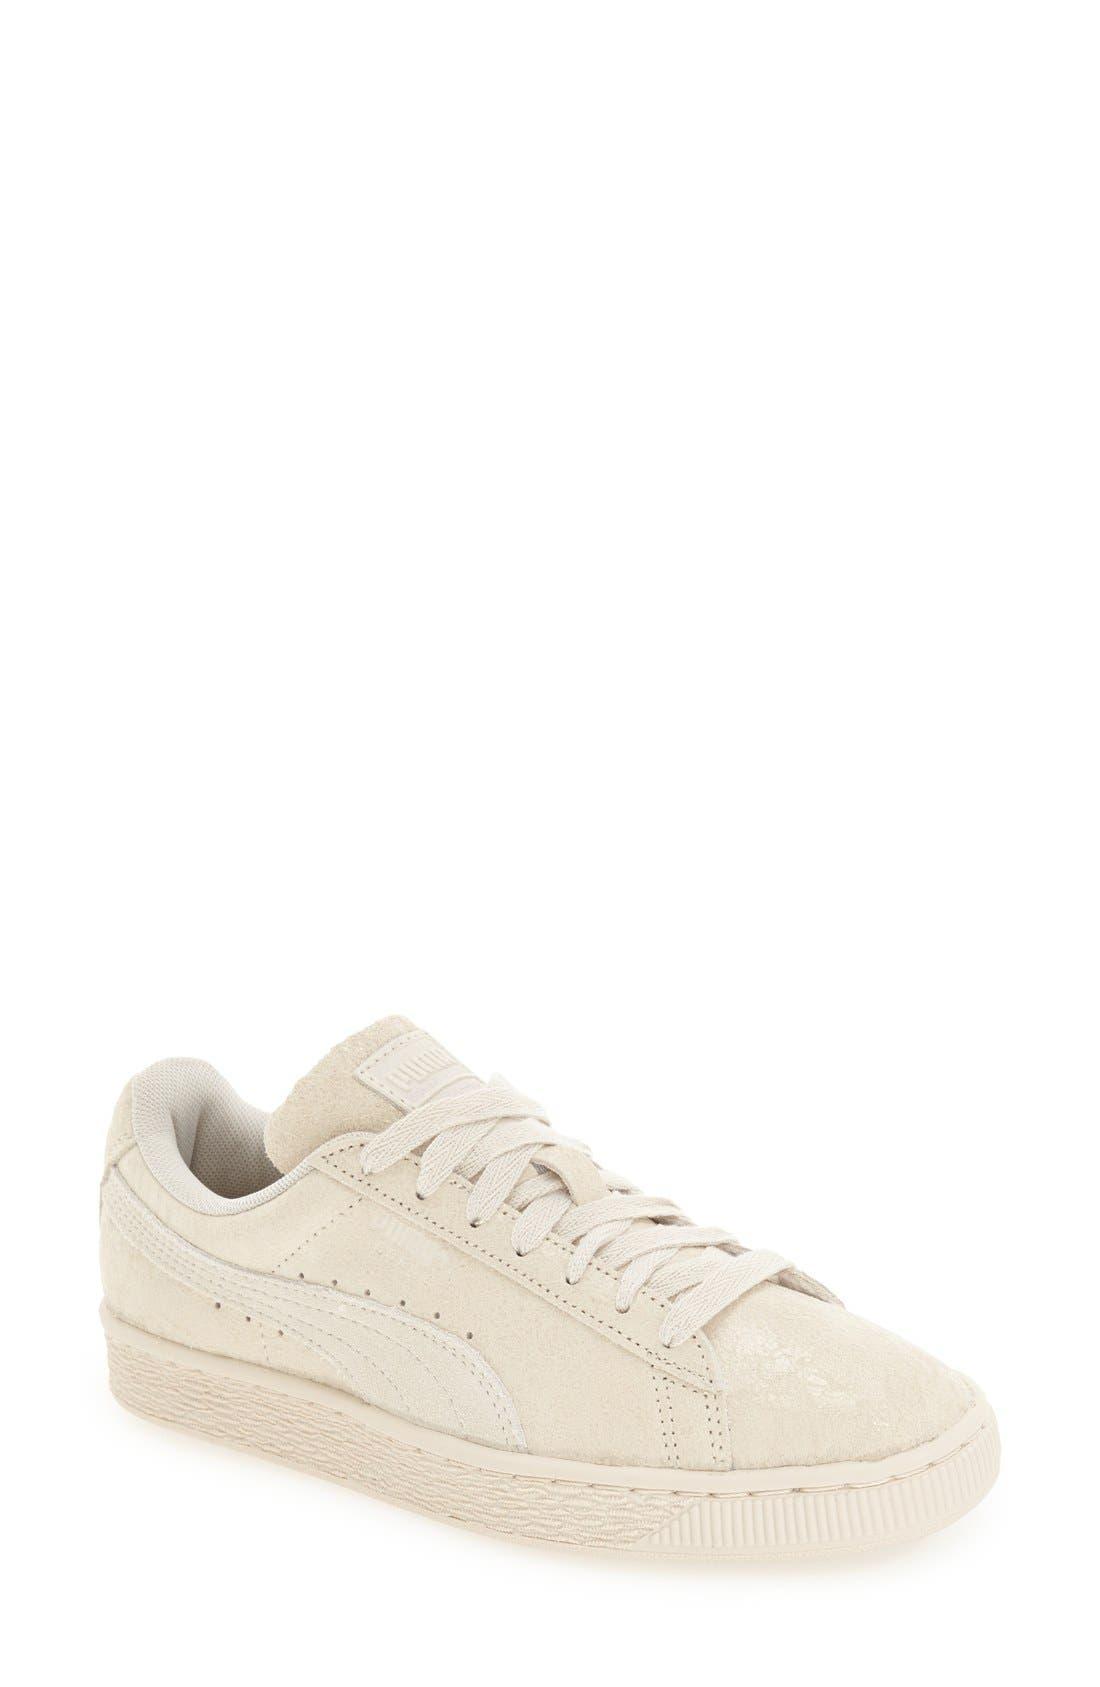 Main Image - PUMA 'Remaster' Sneaker (Women)